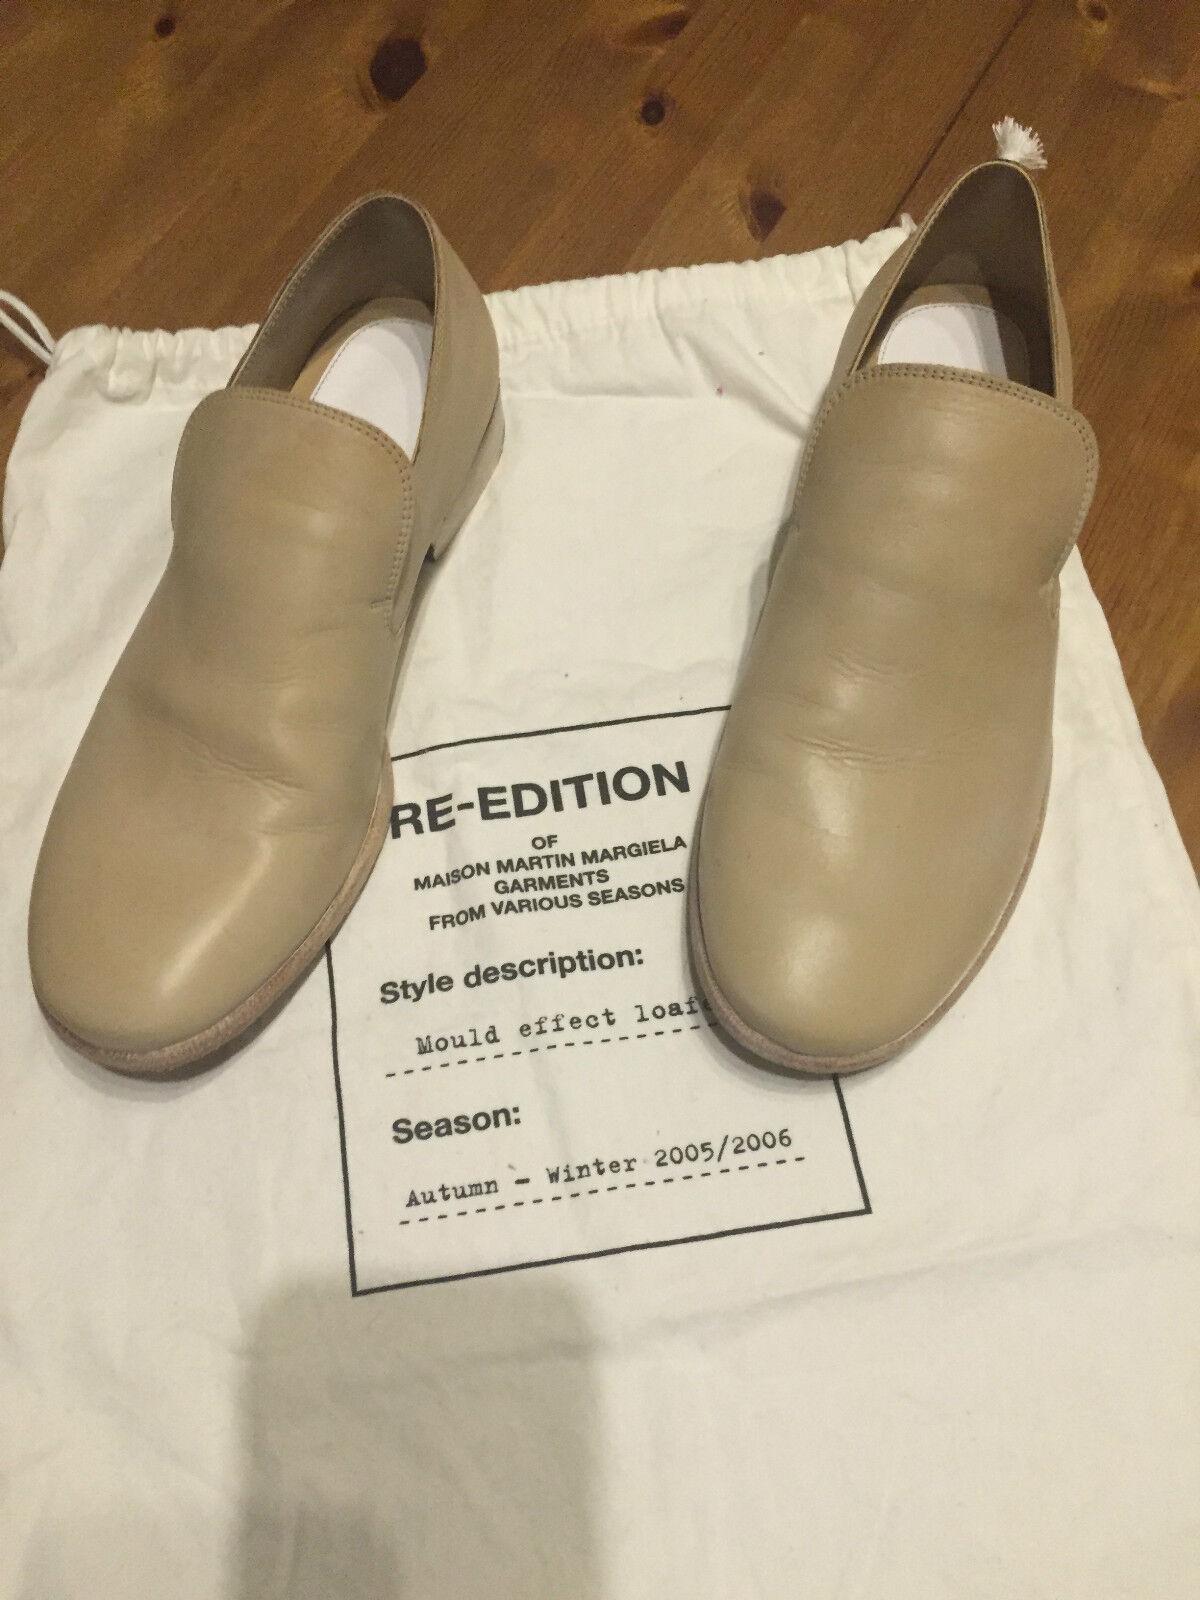 maison martin margiela Schuhe Halbschuhe loafer Leder Leather EUR Gr. 40 / US 7